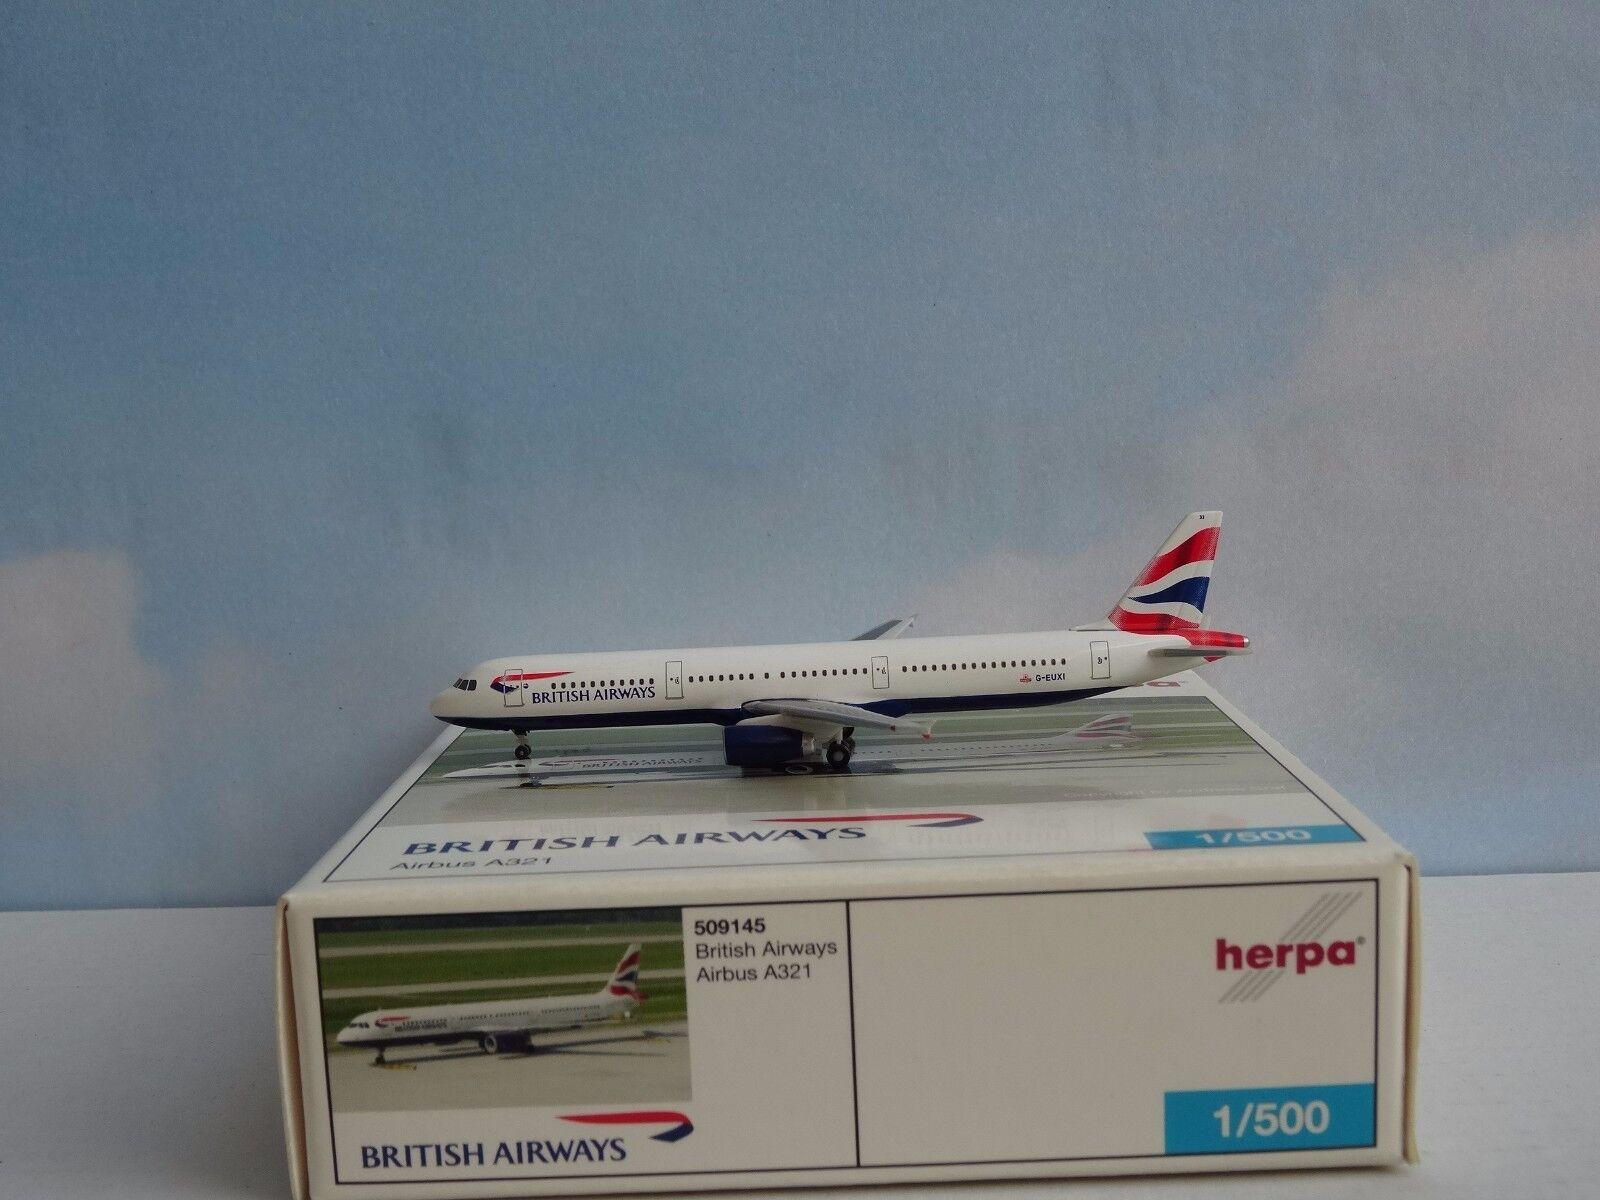 Herpa Wings 1 500 airbus a321 british airways (Art. no no no 509145) 0b272d